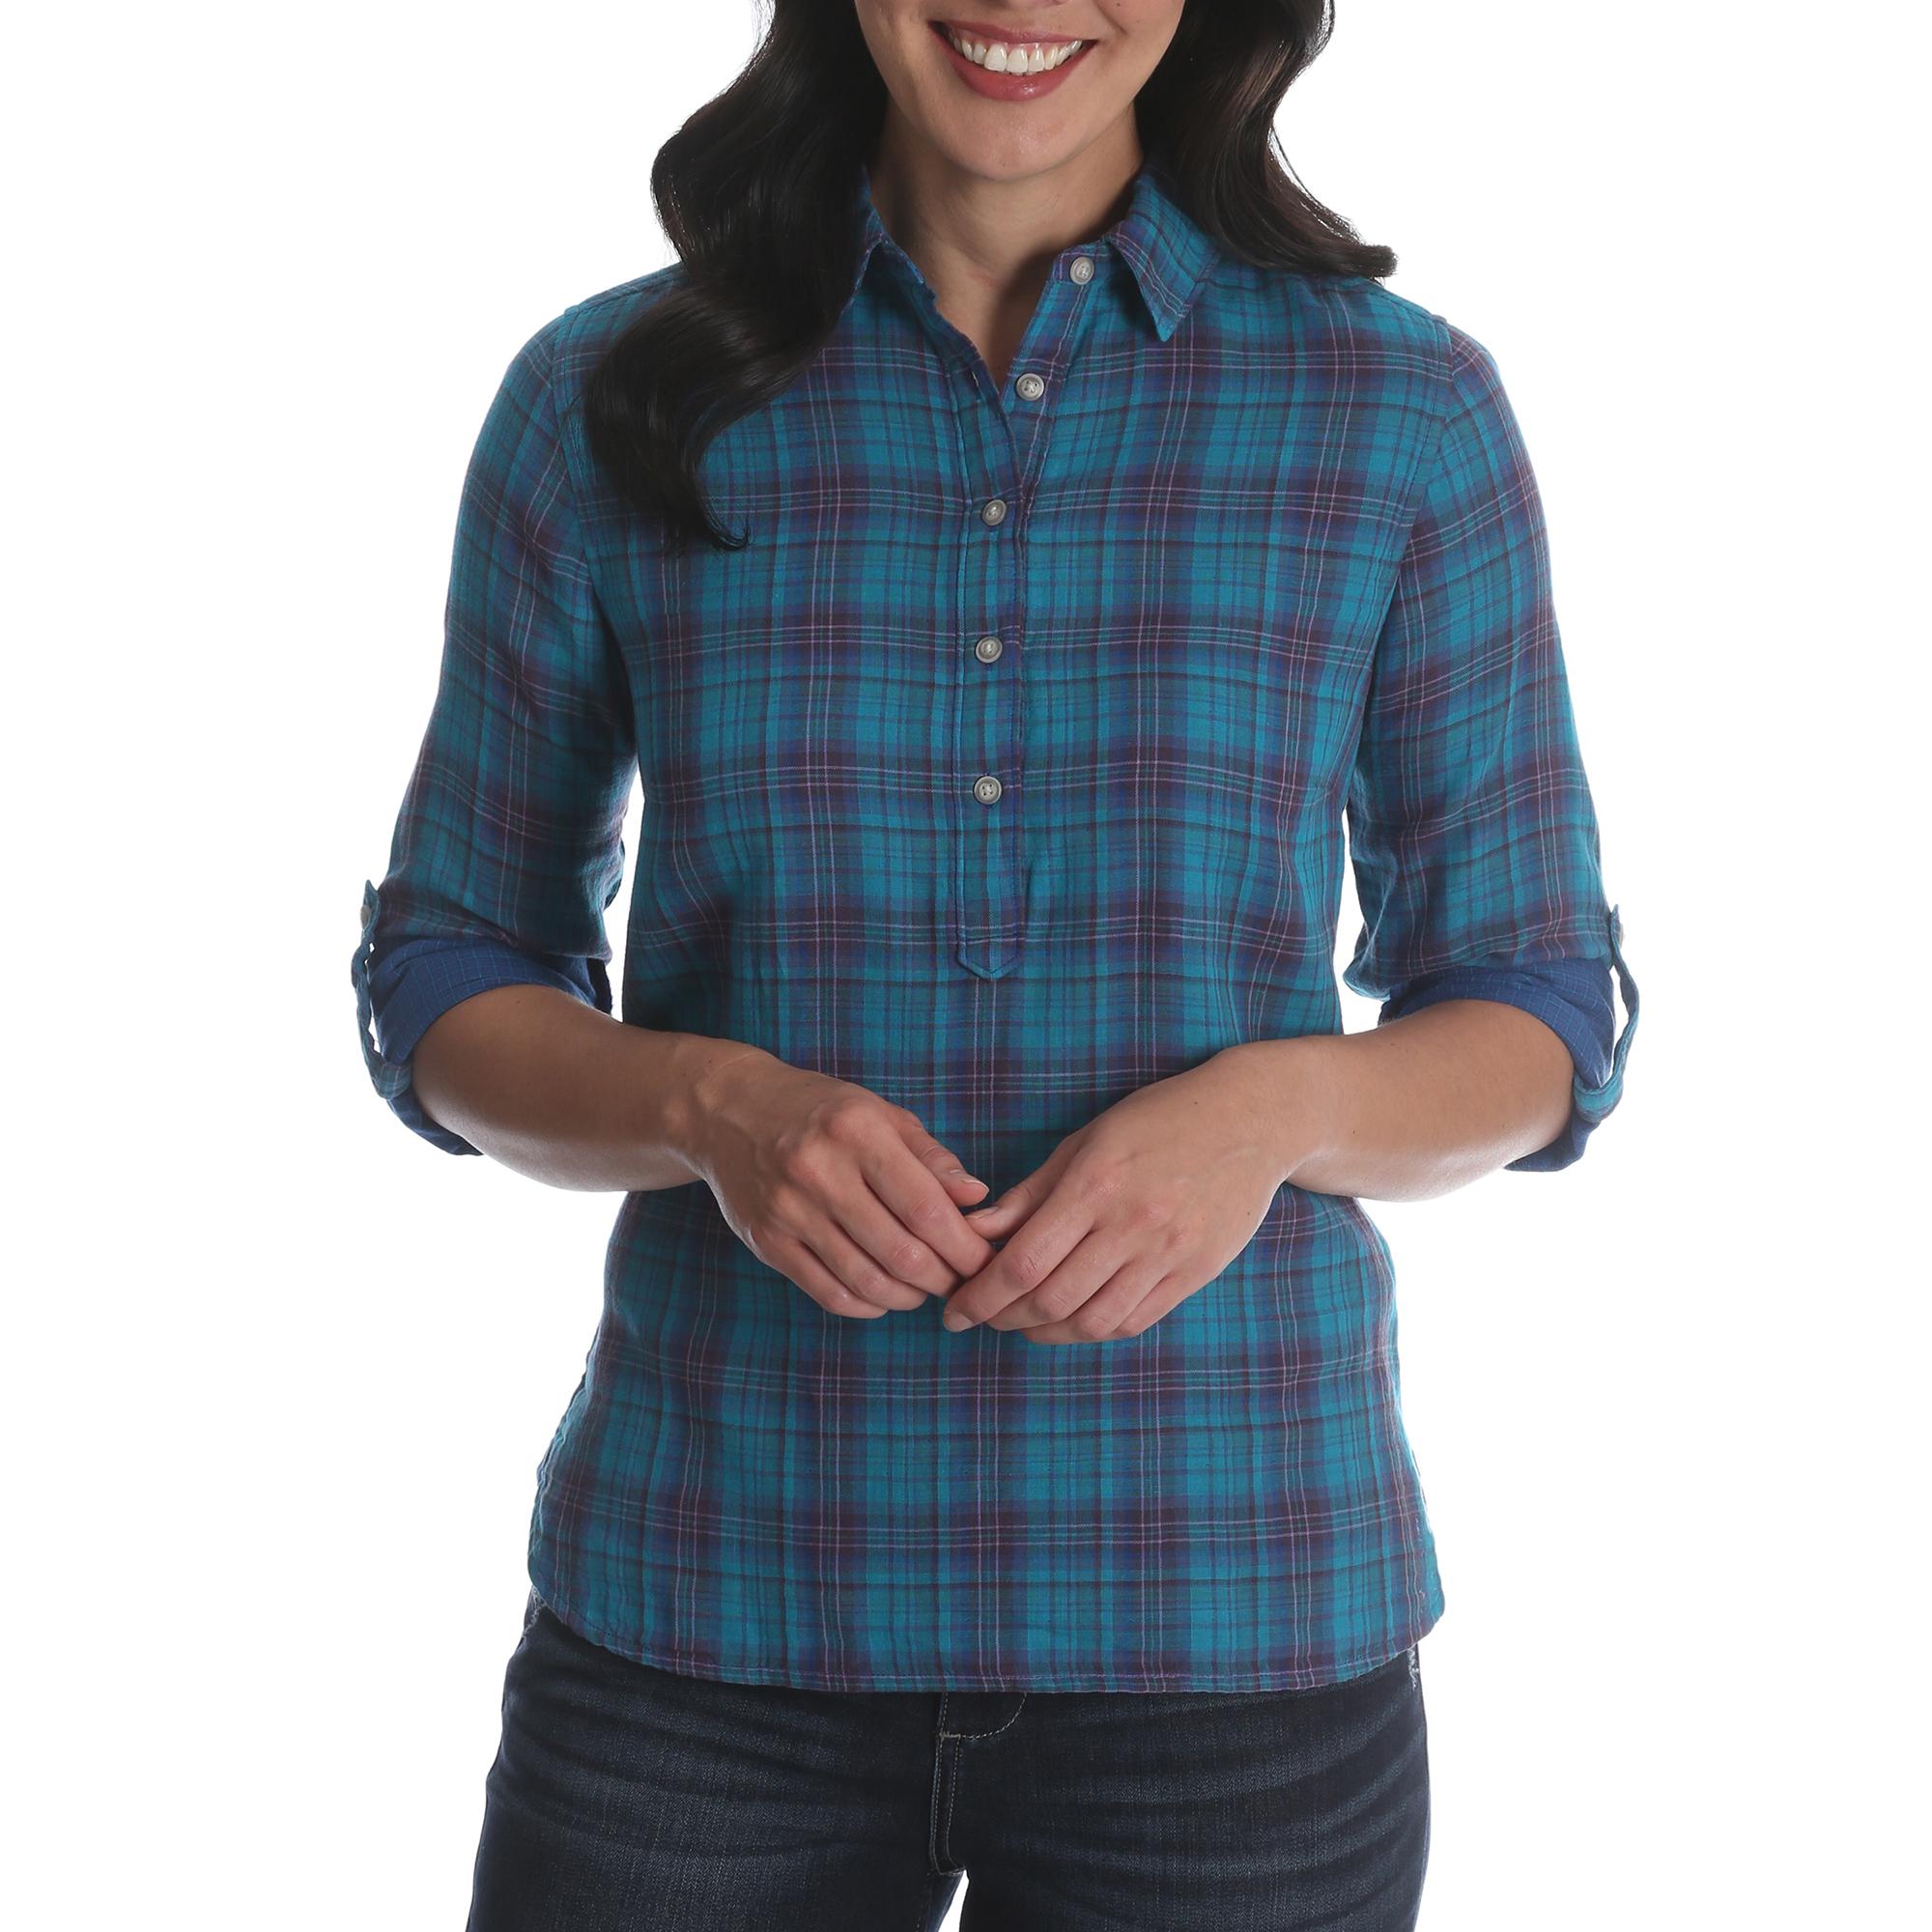 SLP6KVB - Double Cloth Shirt